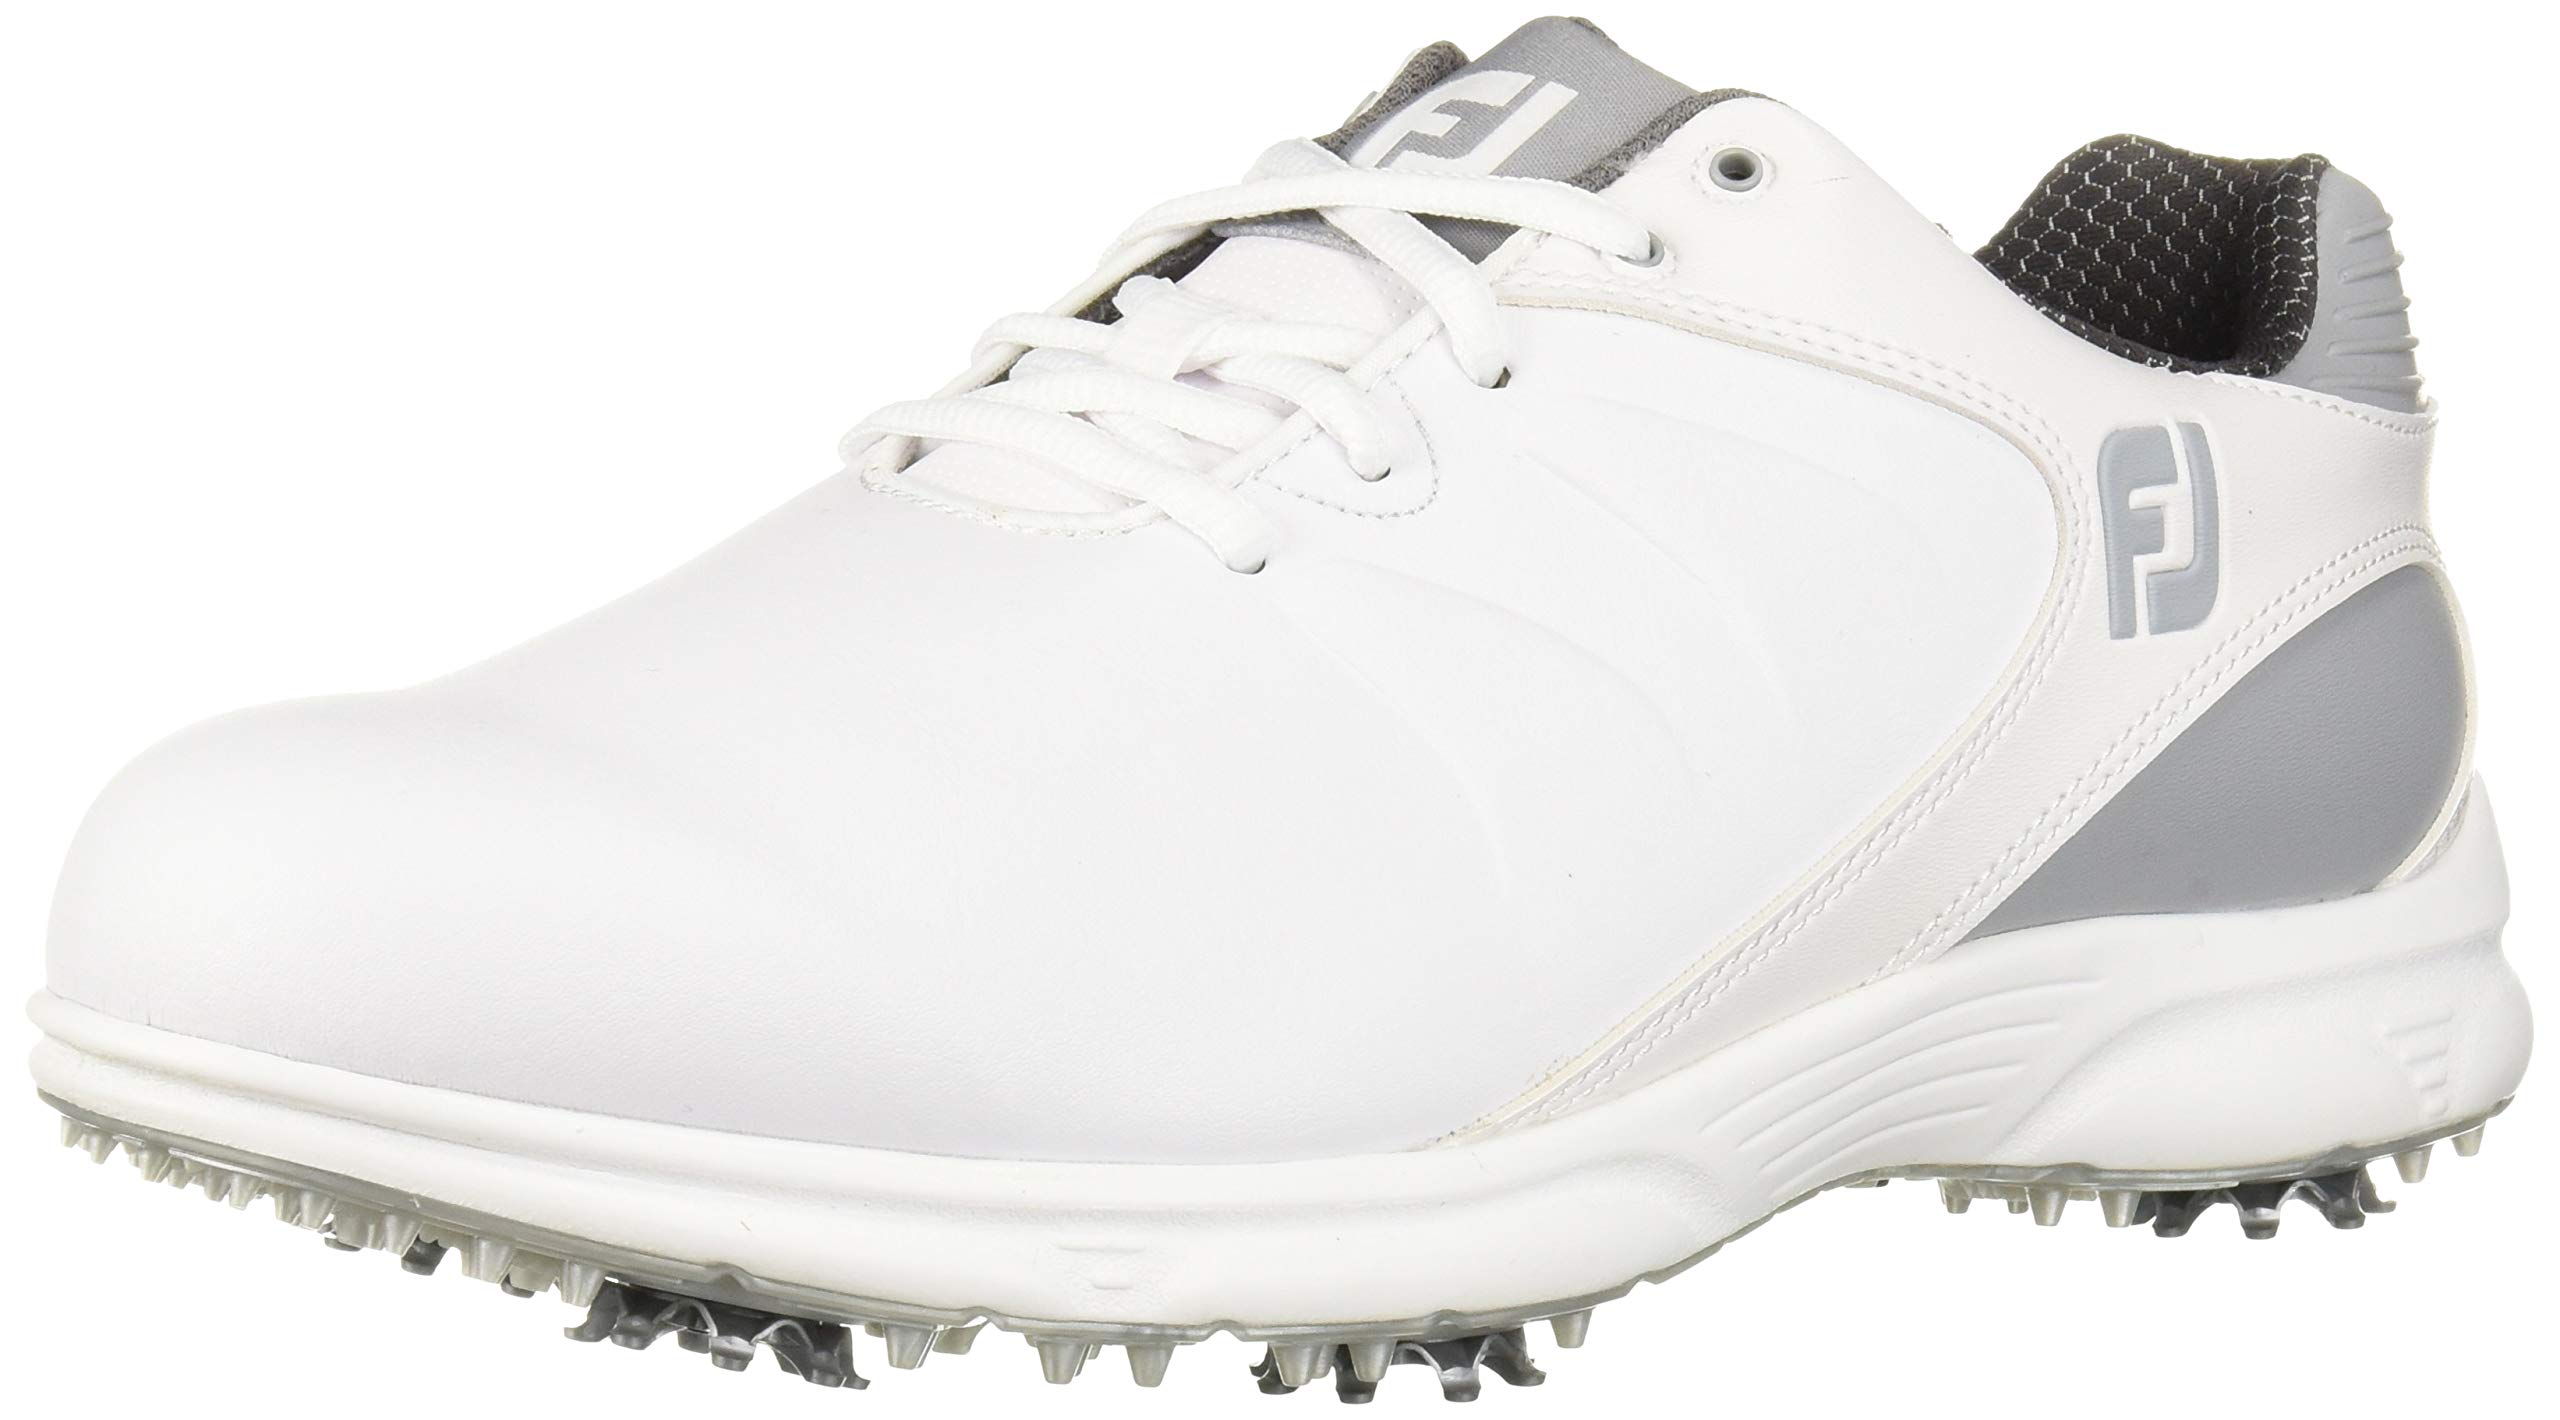 FootJoy Men's ARC XT Golf Shoes, White, 12 XW by FootJoy